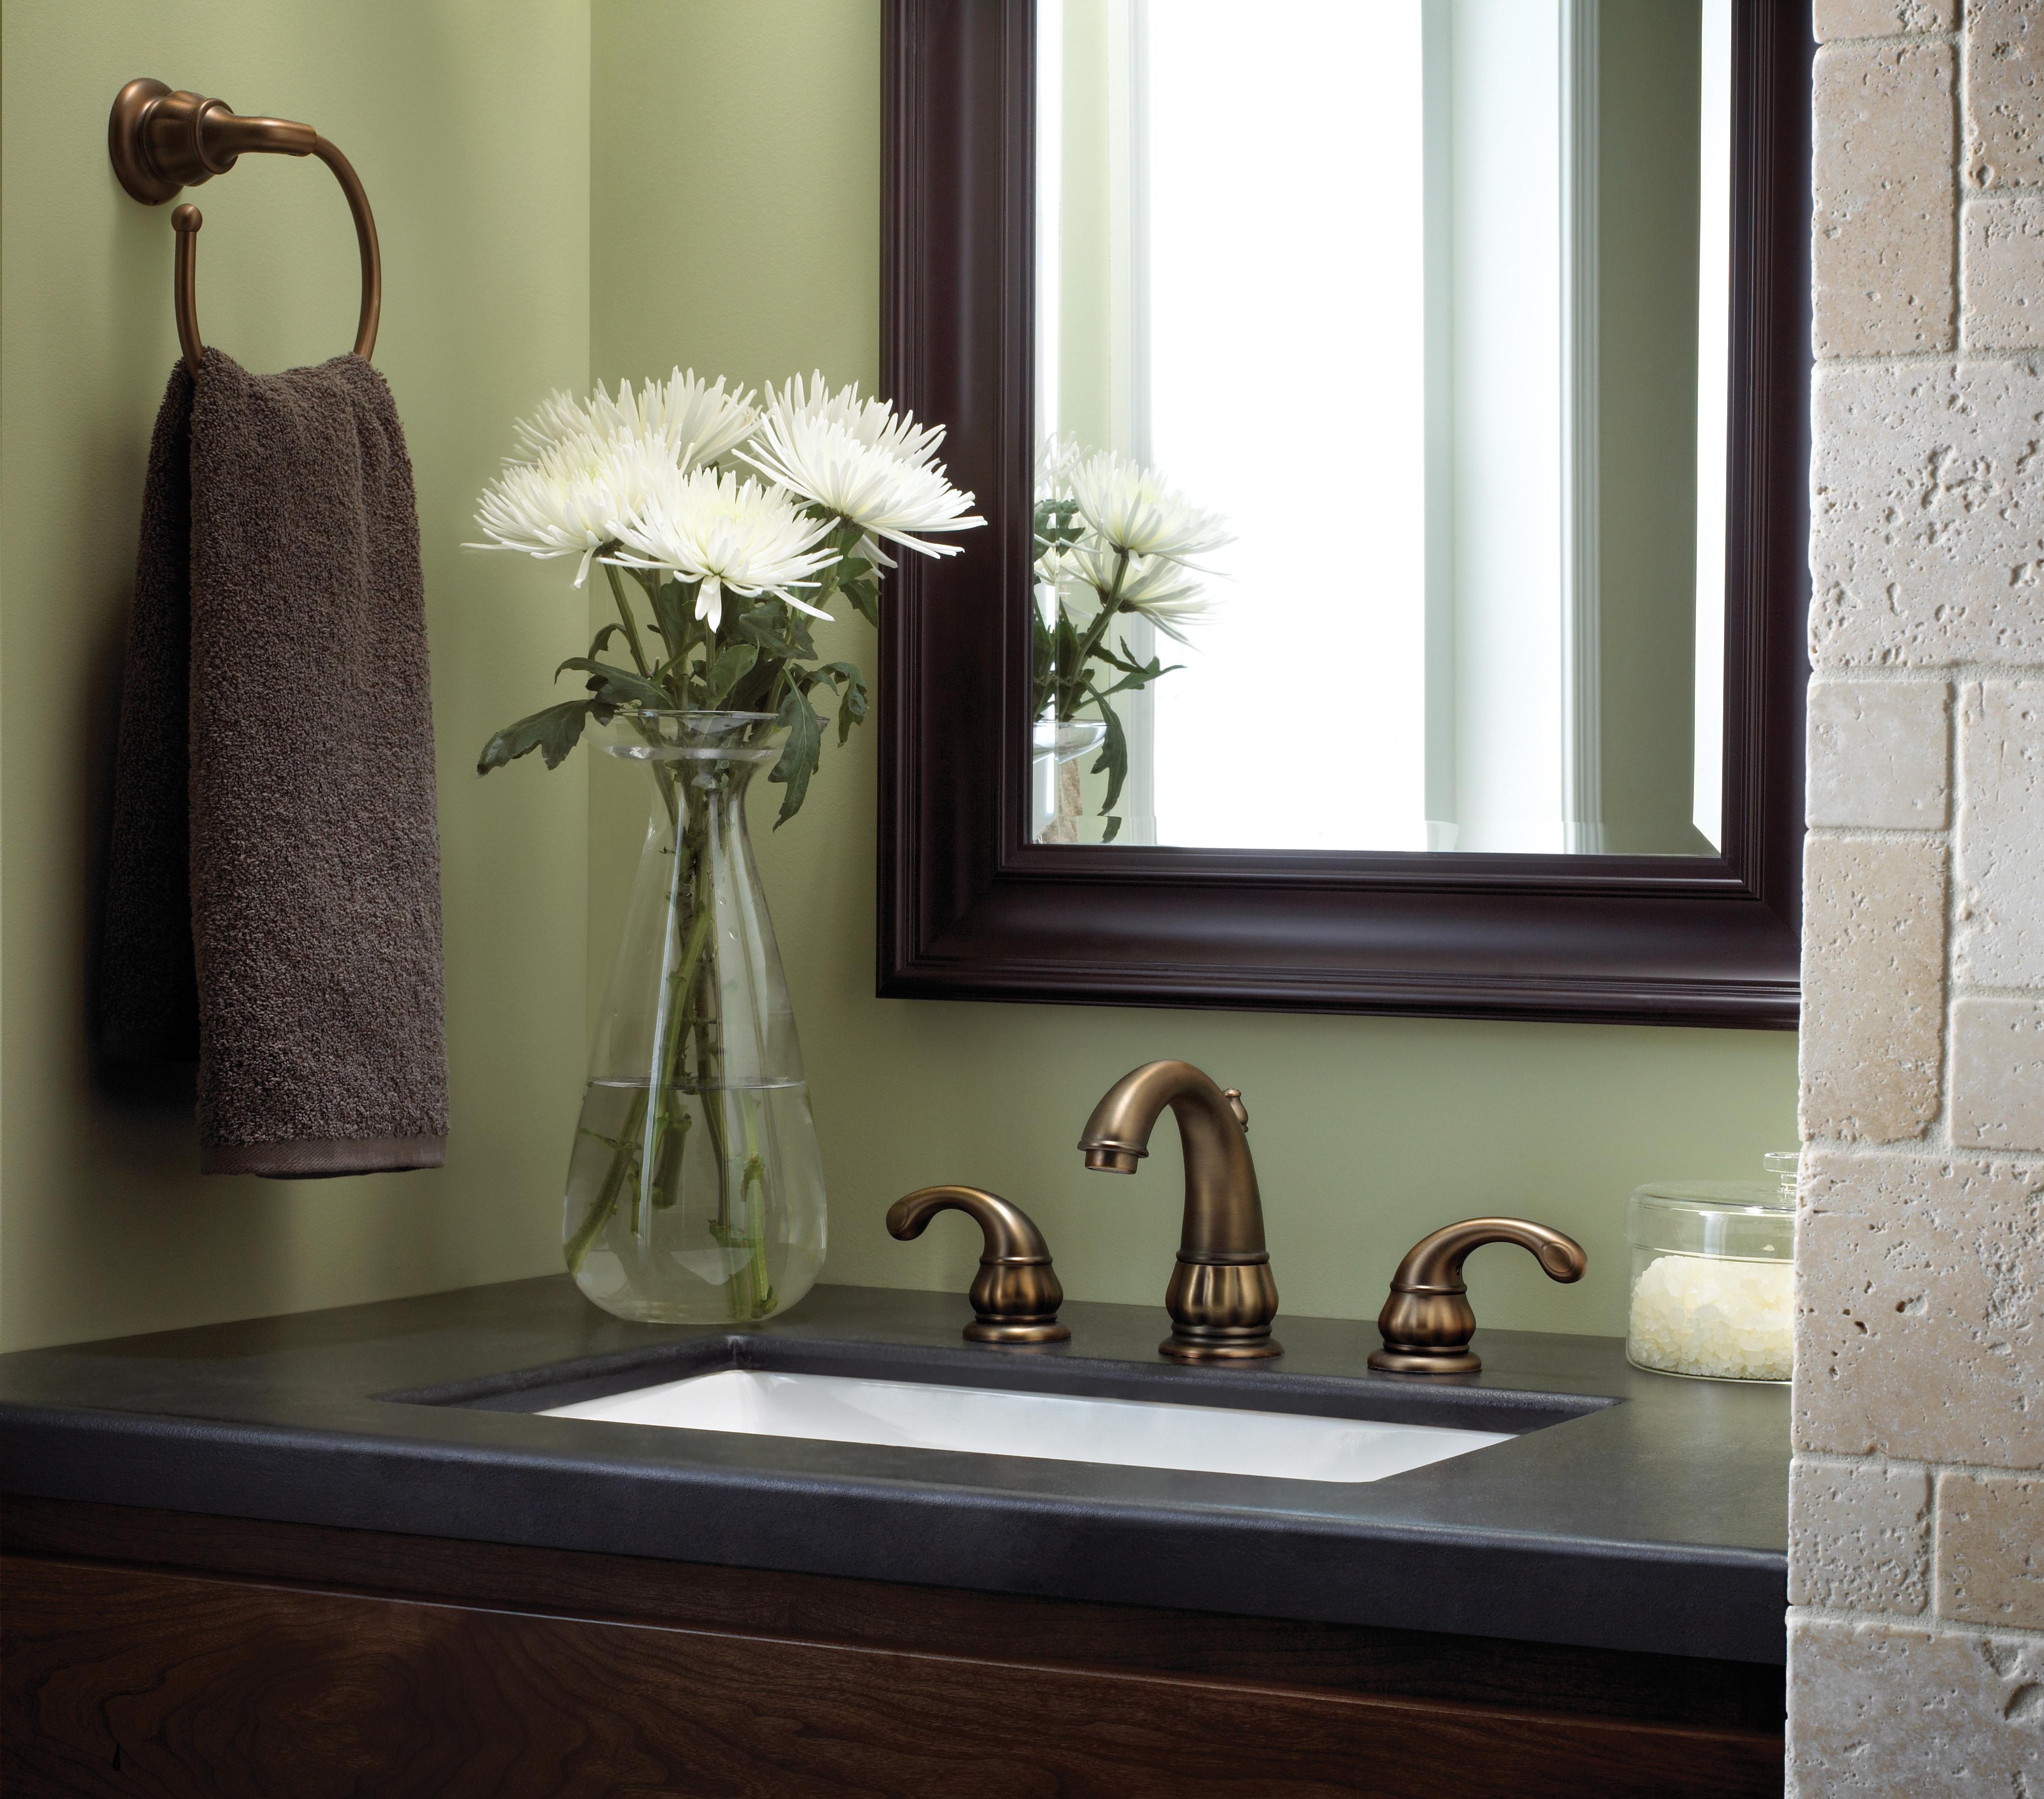 Price Pfister Introduces Never-Before-Seen Velvet Aged Bronze Finish